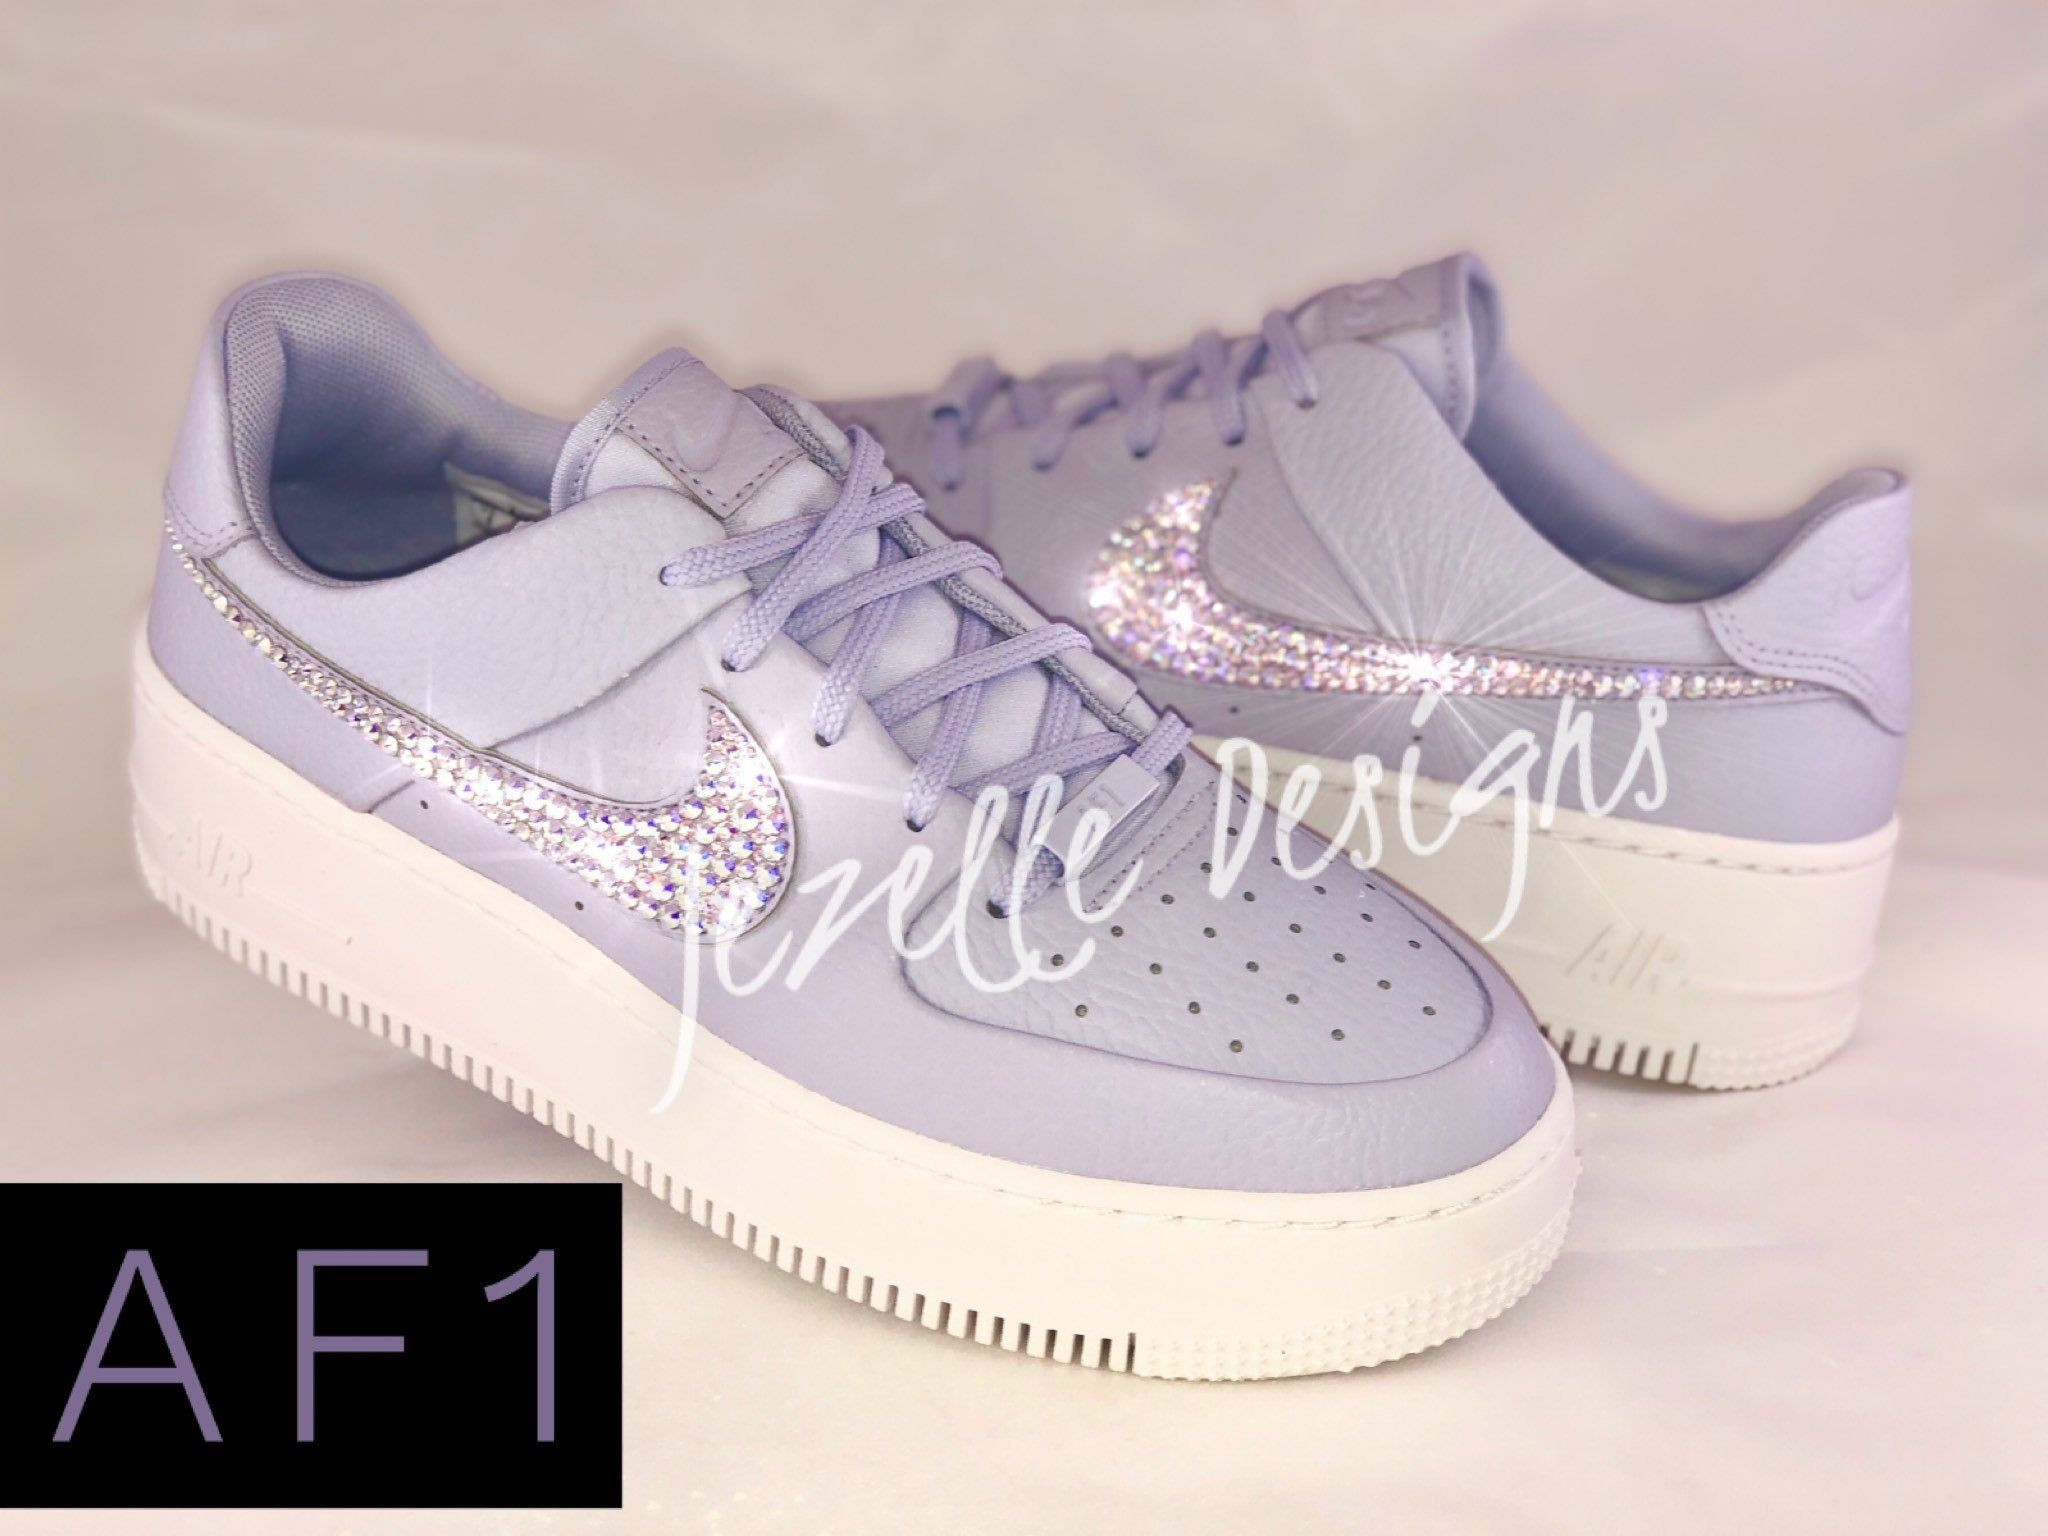 Bling Nike Women S Air Force 1 Af1 Sage Low Casual Shoes Etsy Bling Nike Shoes Casual Shoes Nike